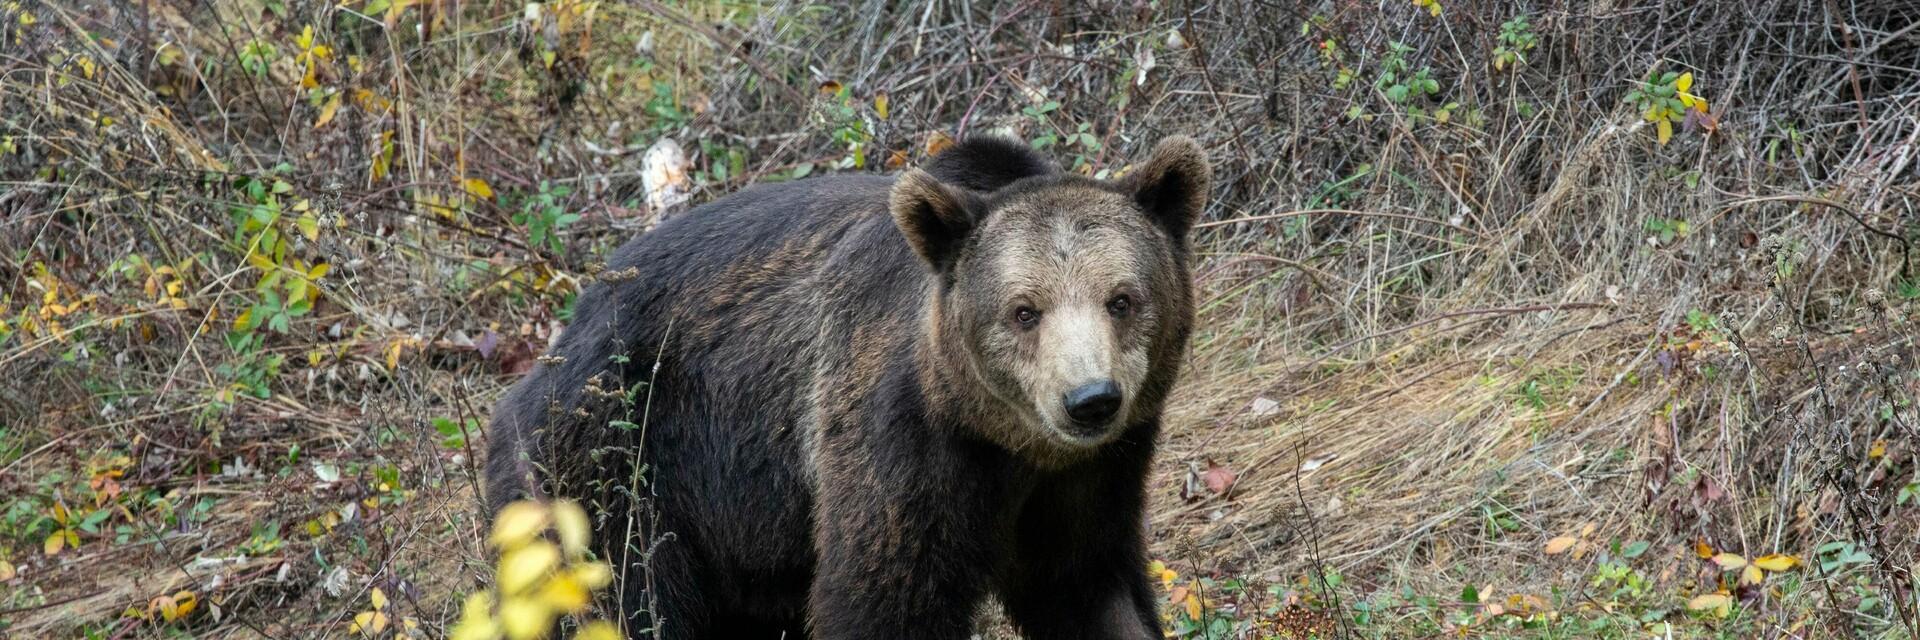 Bear Vesko rescued from Bulgaria